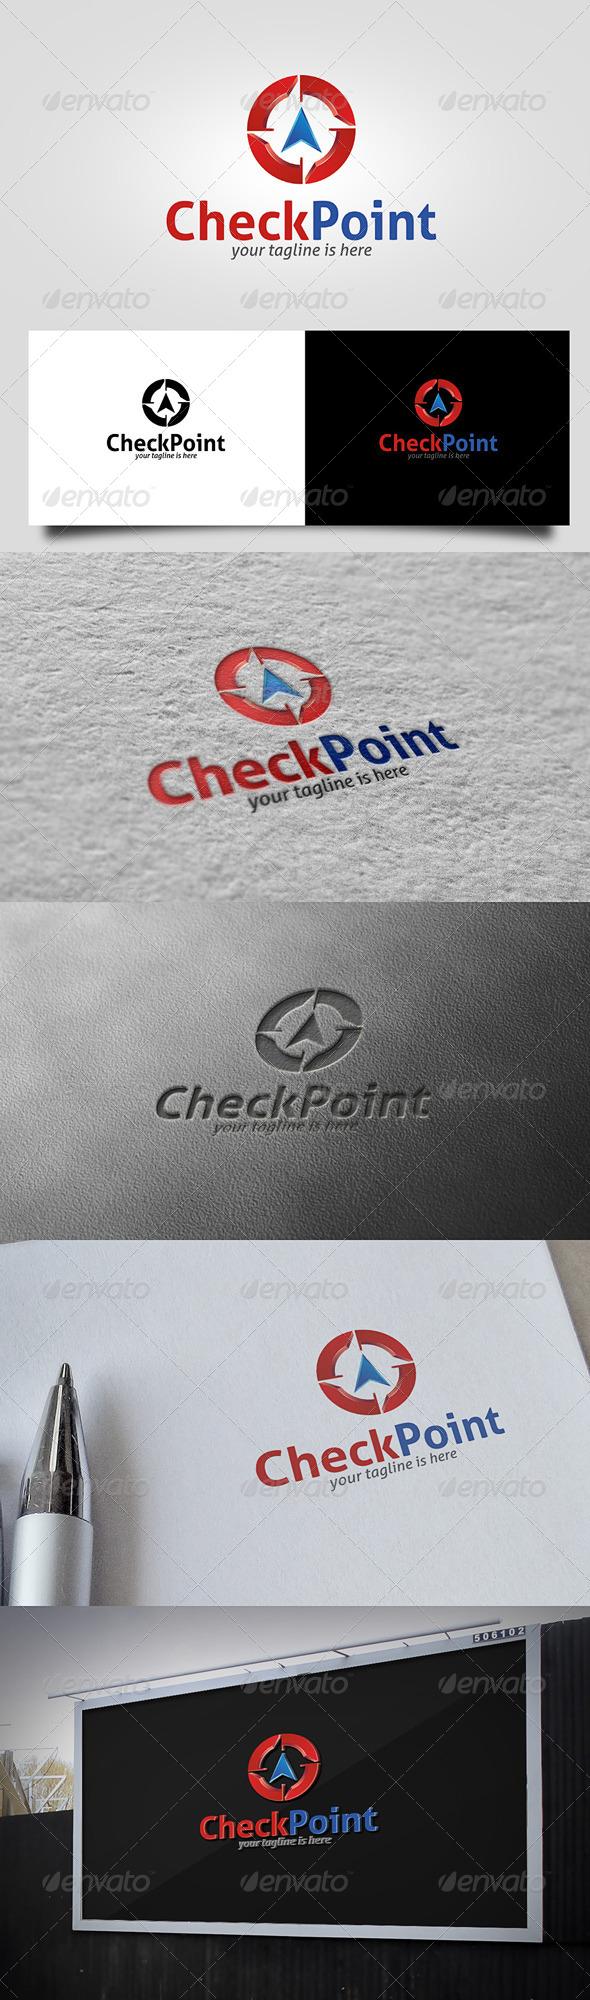 GraphicRiver Checkpoint Logo 5683443